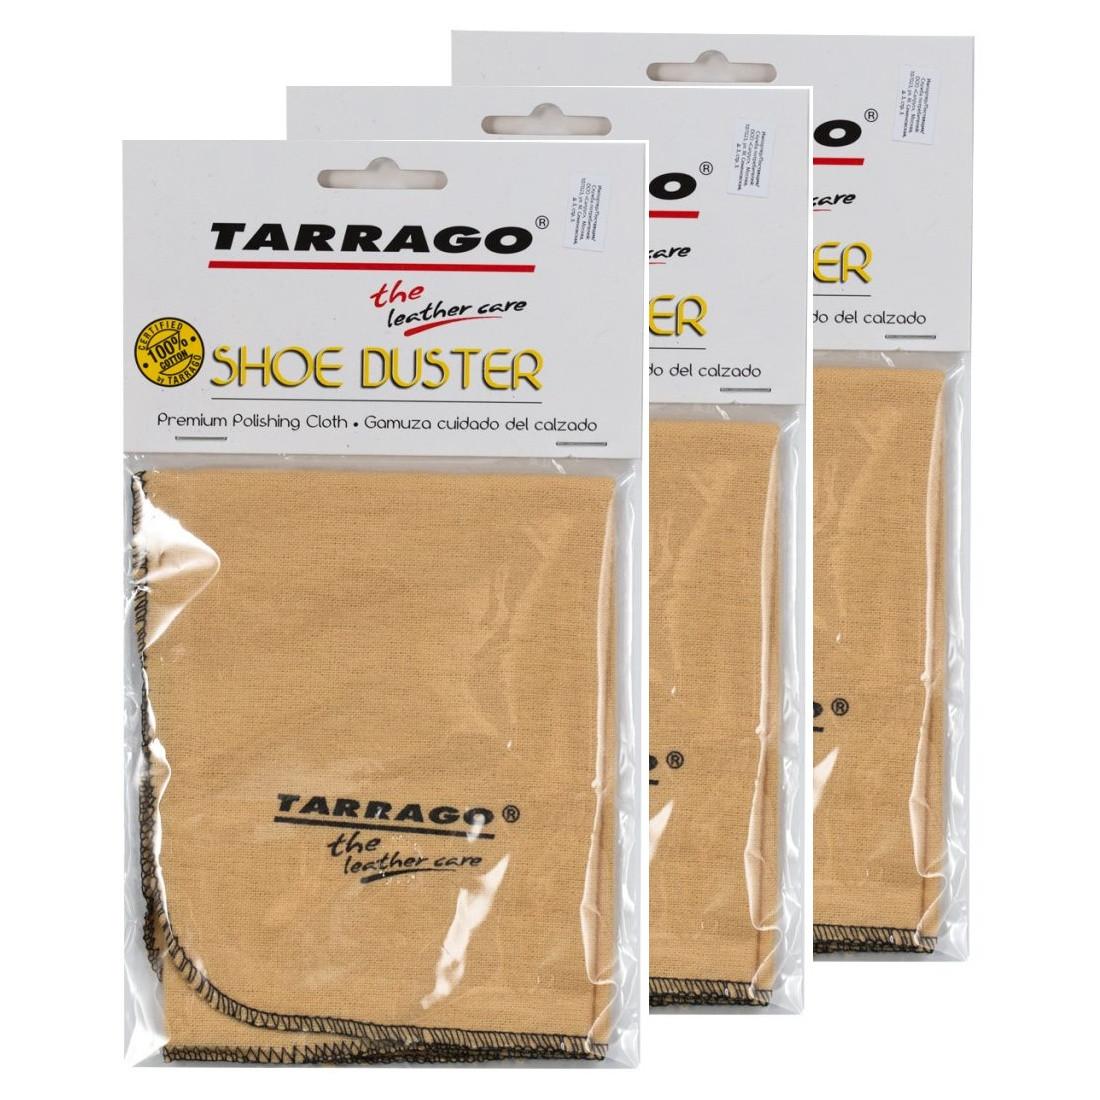 Хлопковая ткань Tarrago Shoe Duster 3 шт.